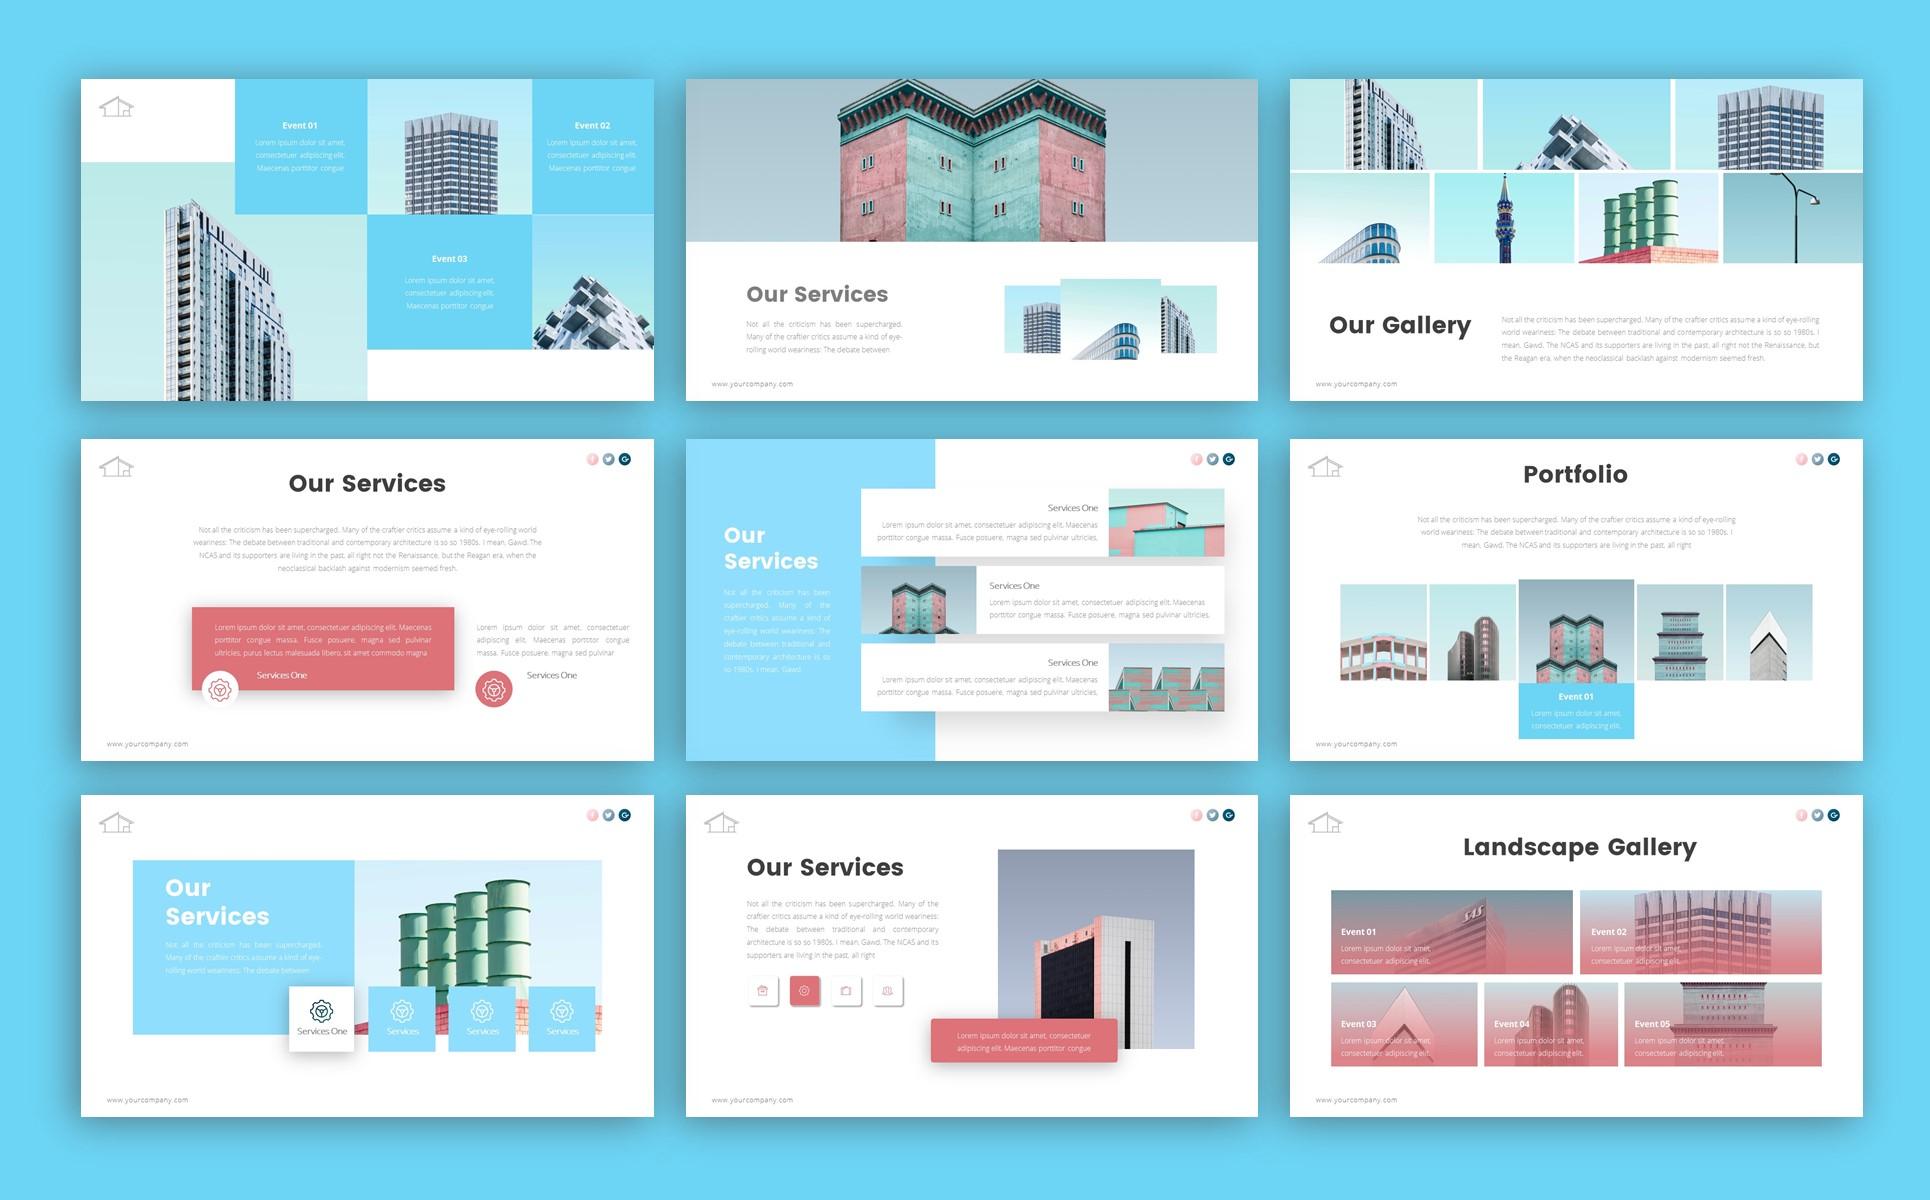 Boulevard Architecture Presentation PowerPoint Template